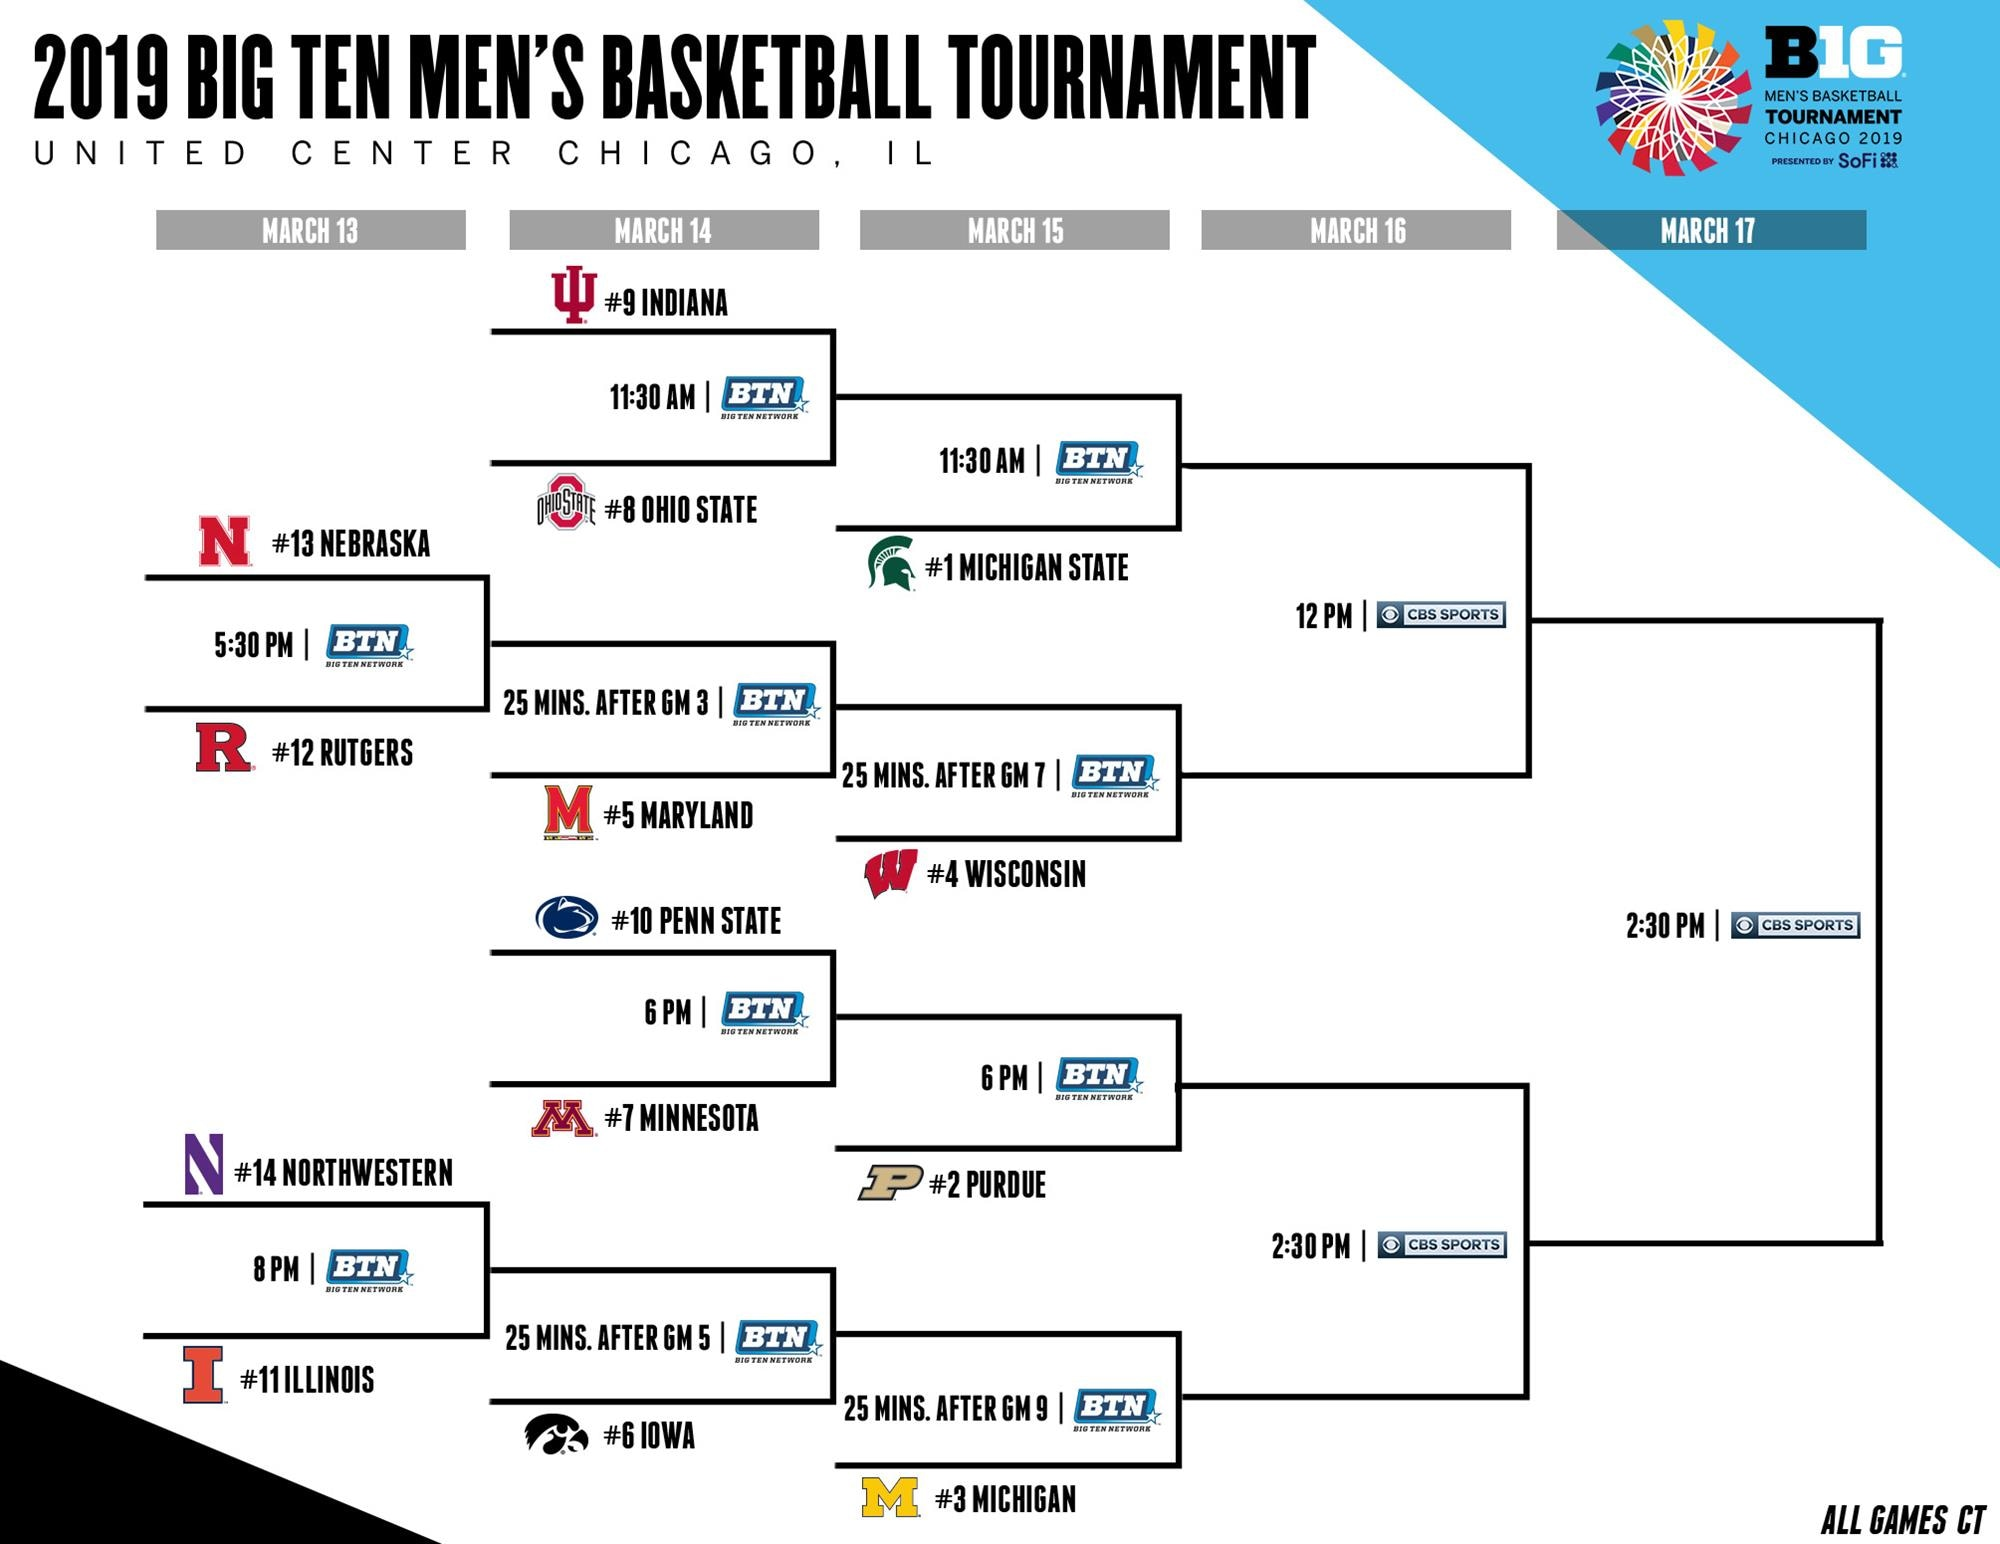 Big Ten Basketball Schedule 2019 Indiana Basketball: Big Ten Tournament preview